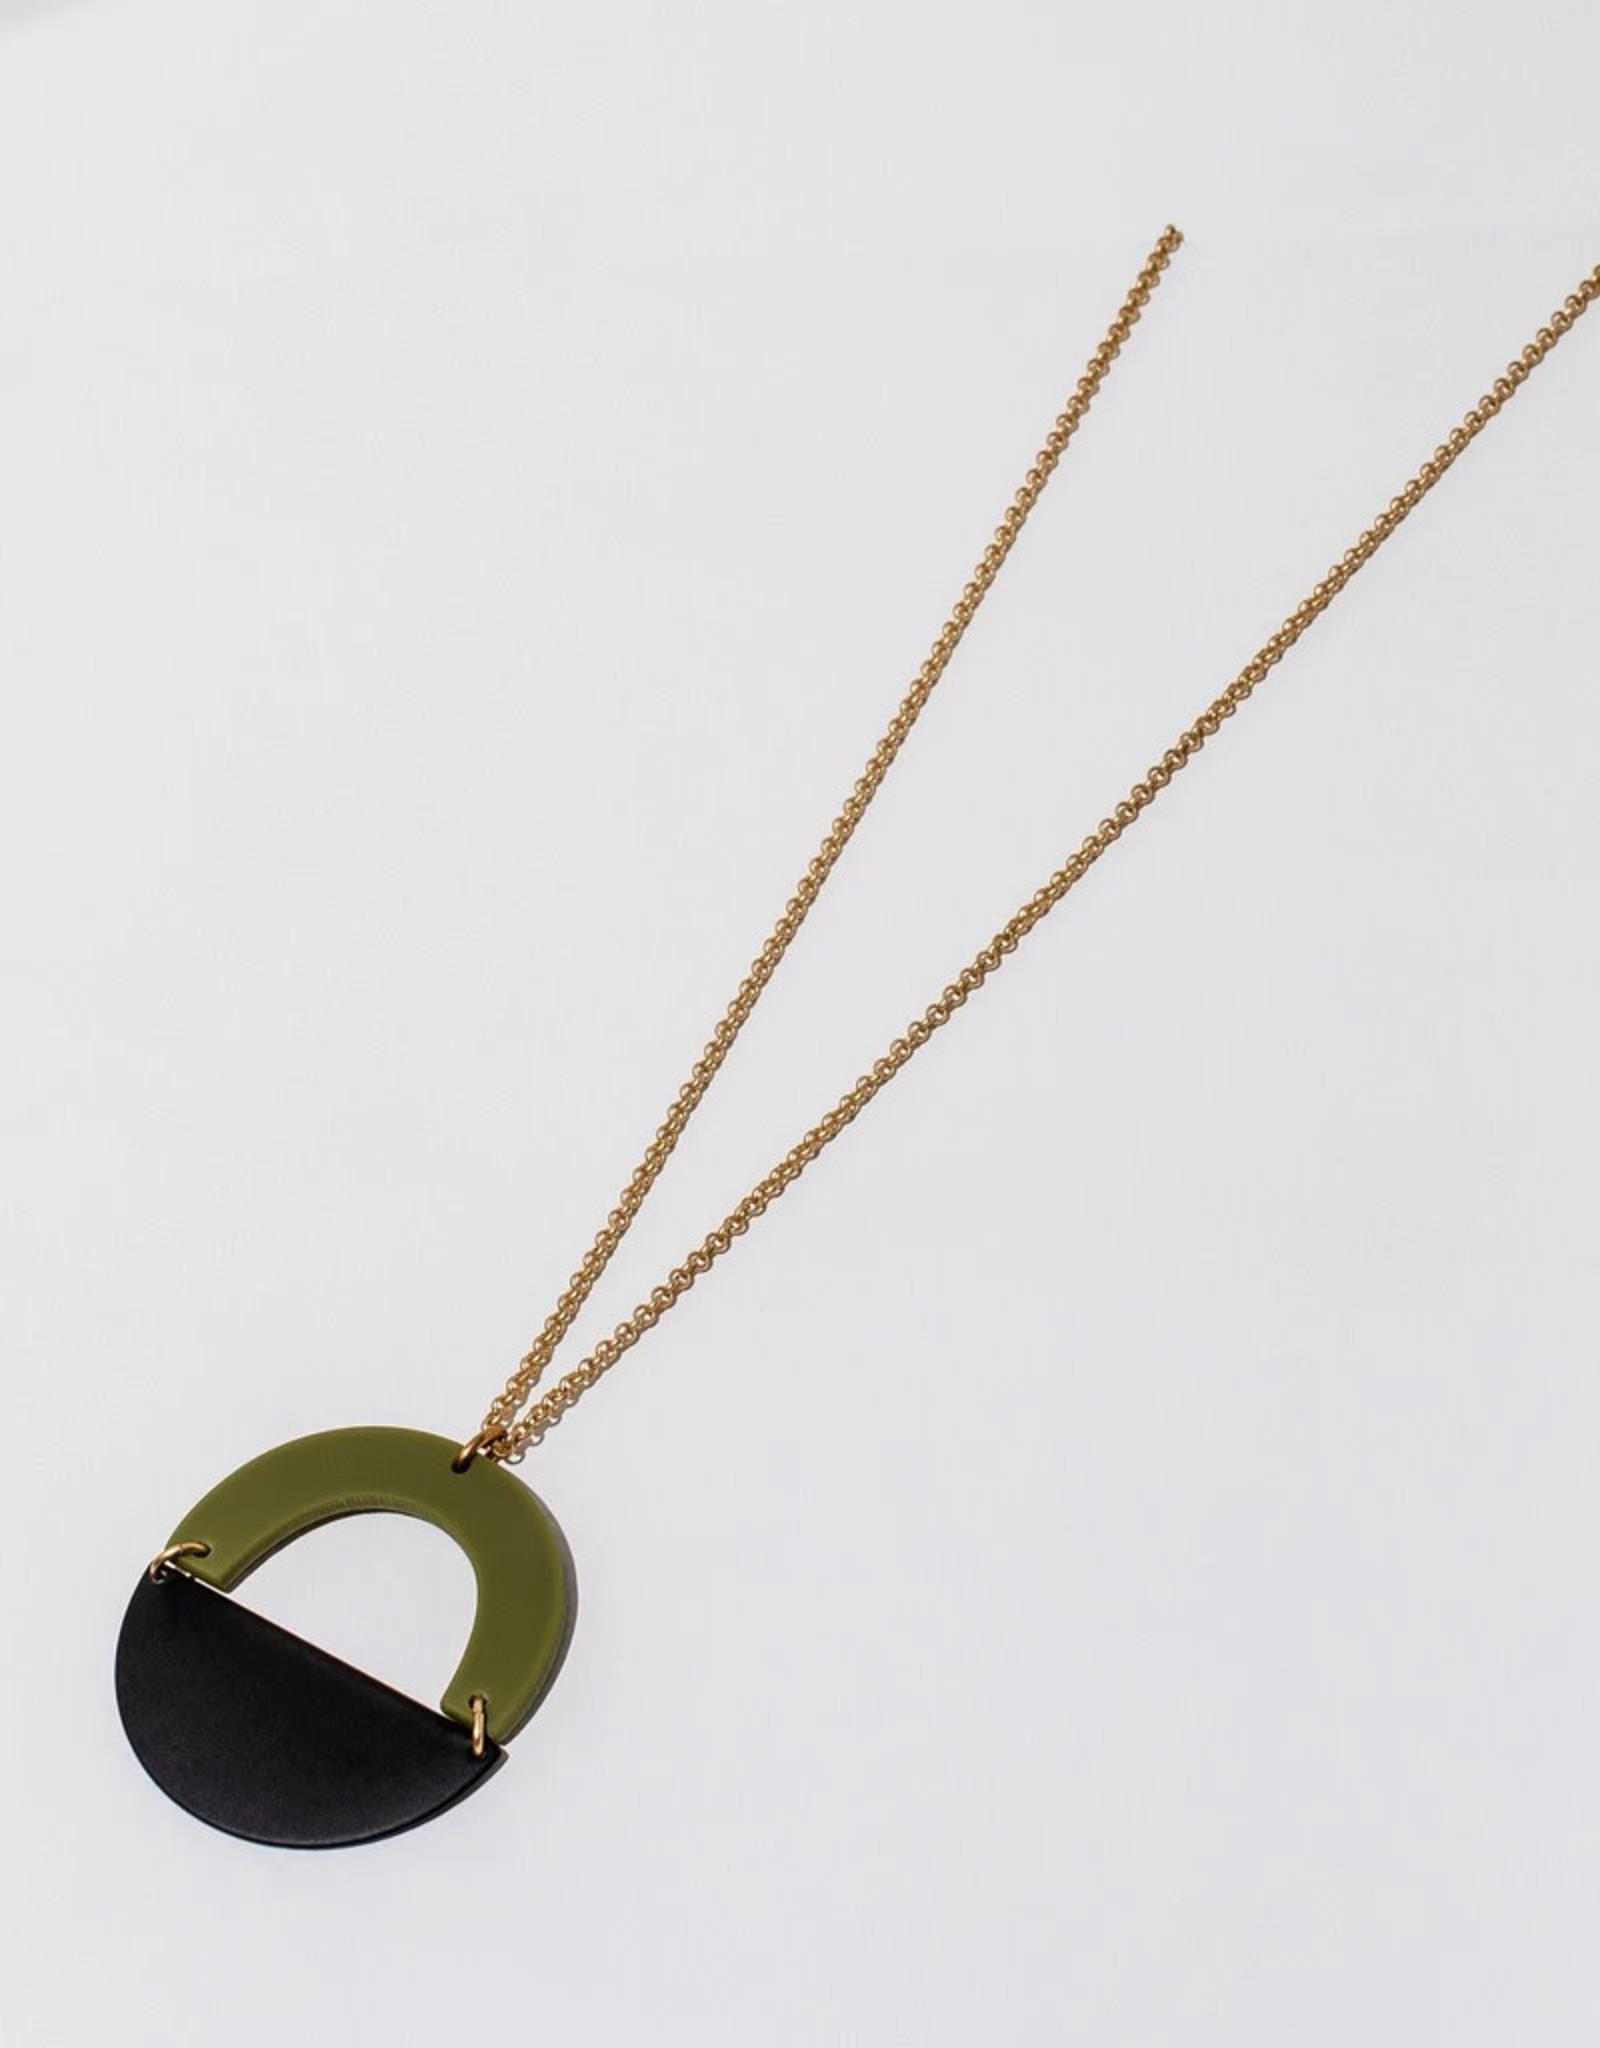 Green and Black Circular Pendant